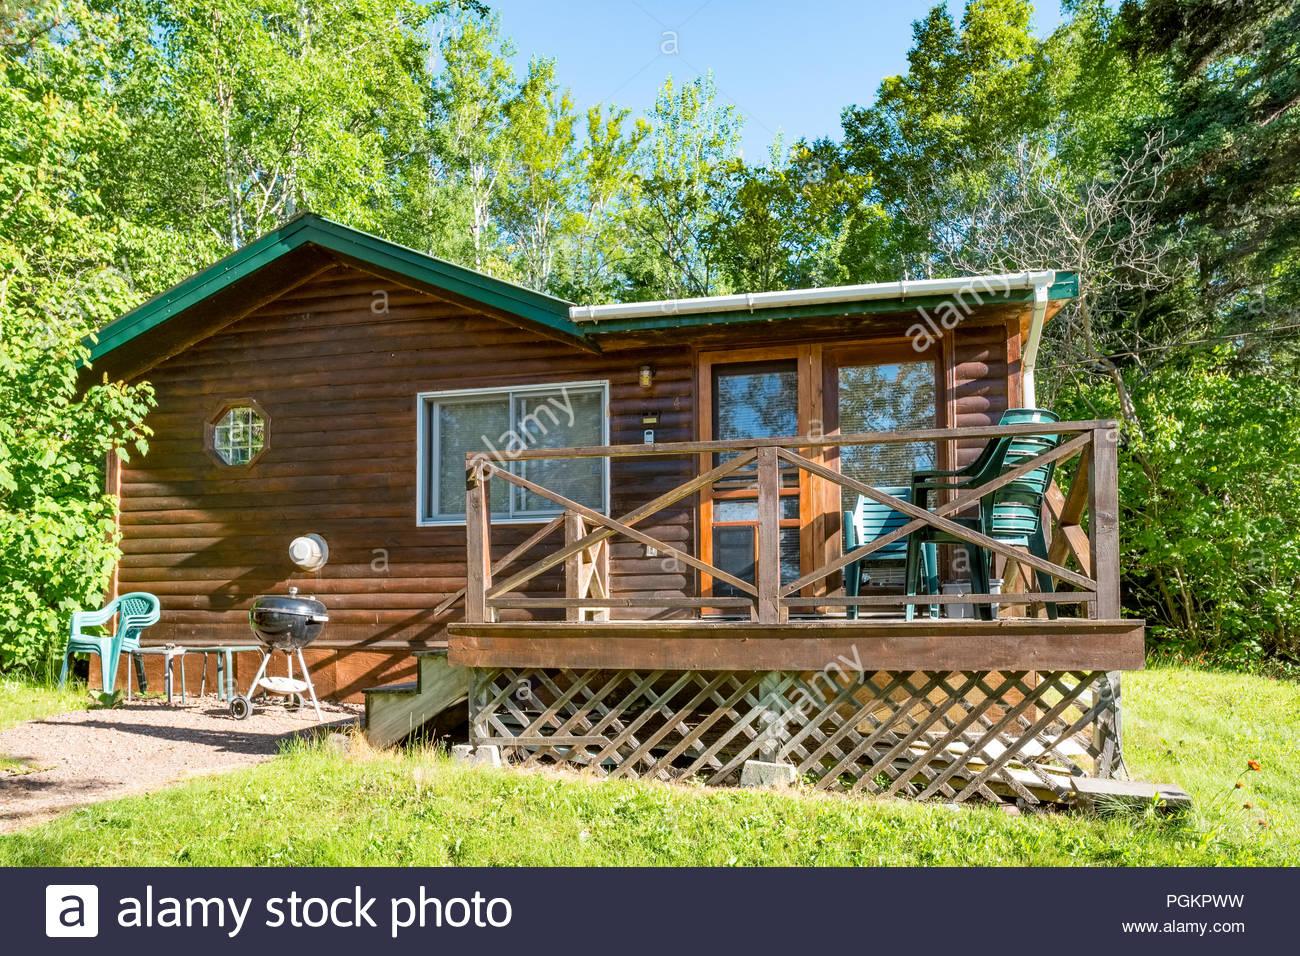 Cabin located a short walk from Lake Superior, near Grand Marais, Minnesota, USA. Stock Photo